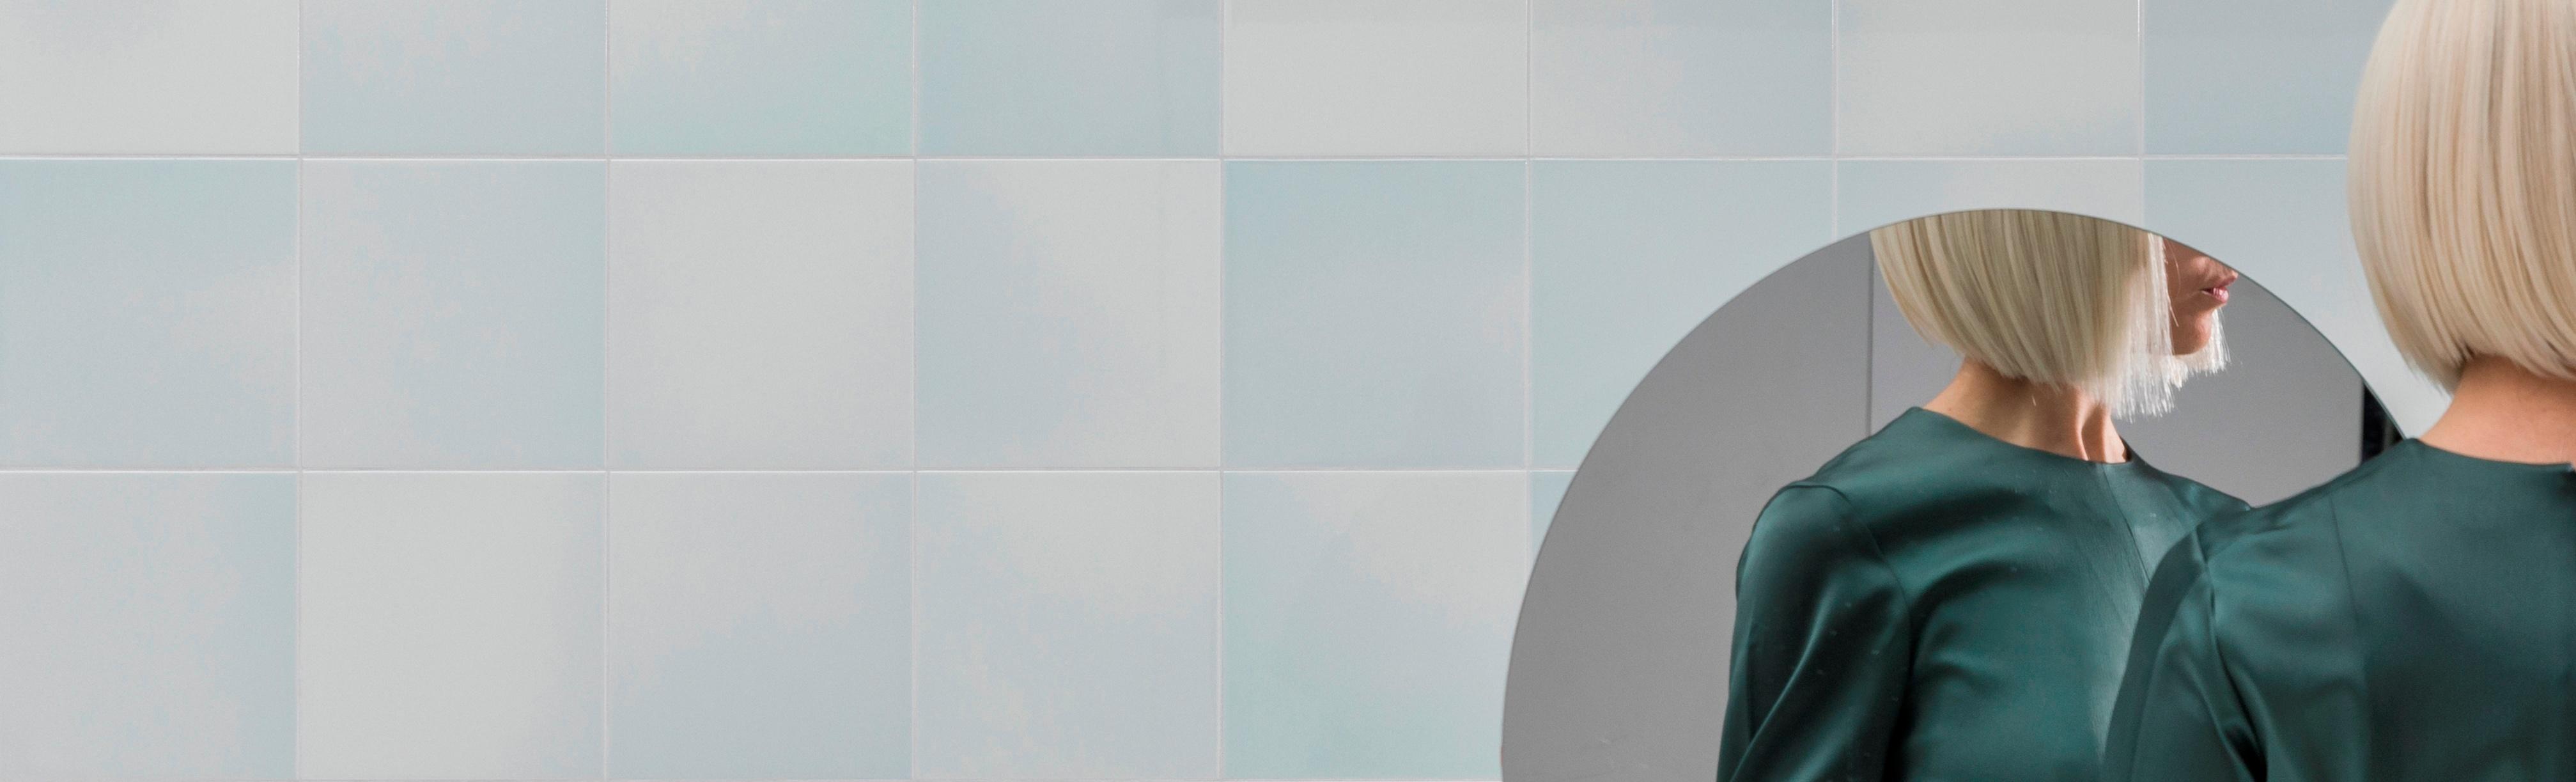 LP Murals Fuse mirror 1.jpg